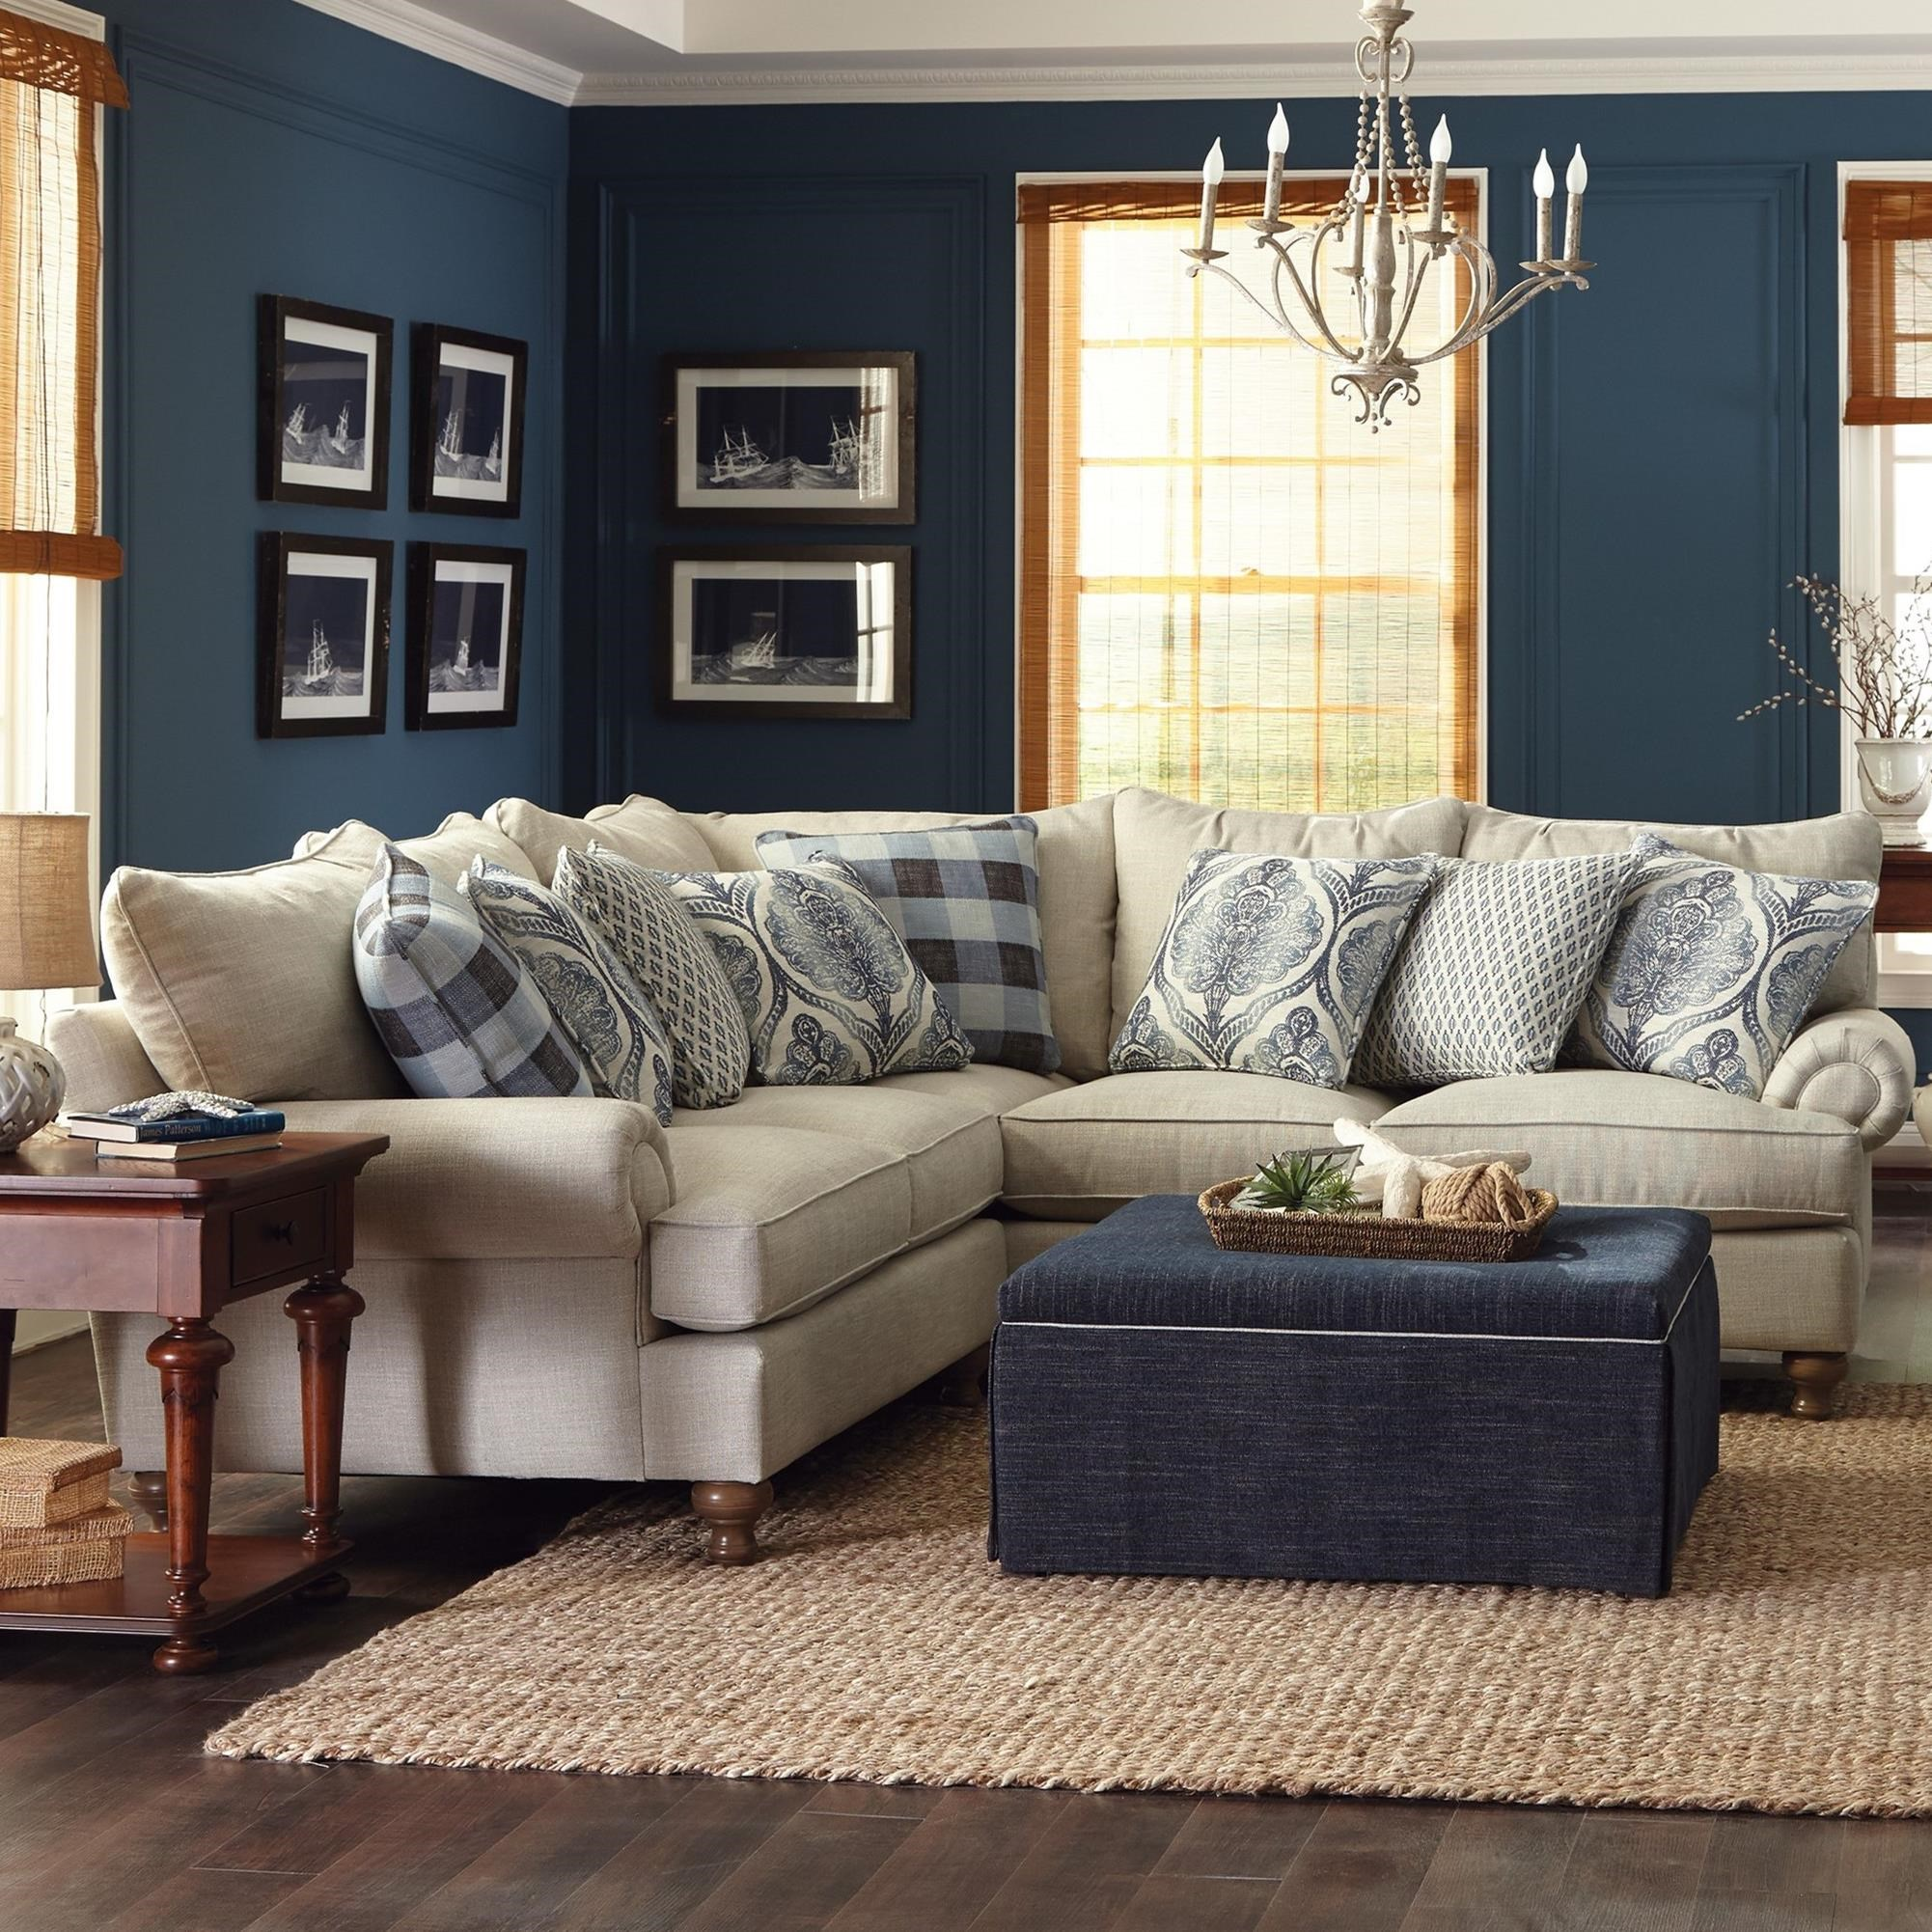 Paula Deen By Craftmaster P711700 2 Piece Sectional Sofa